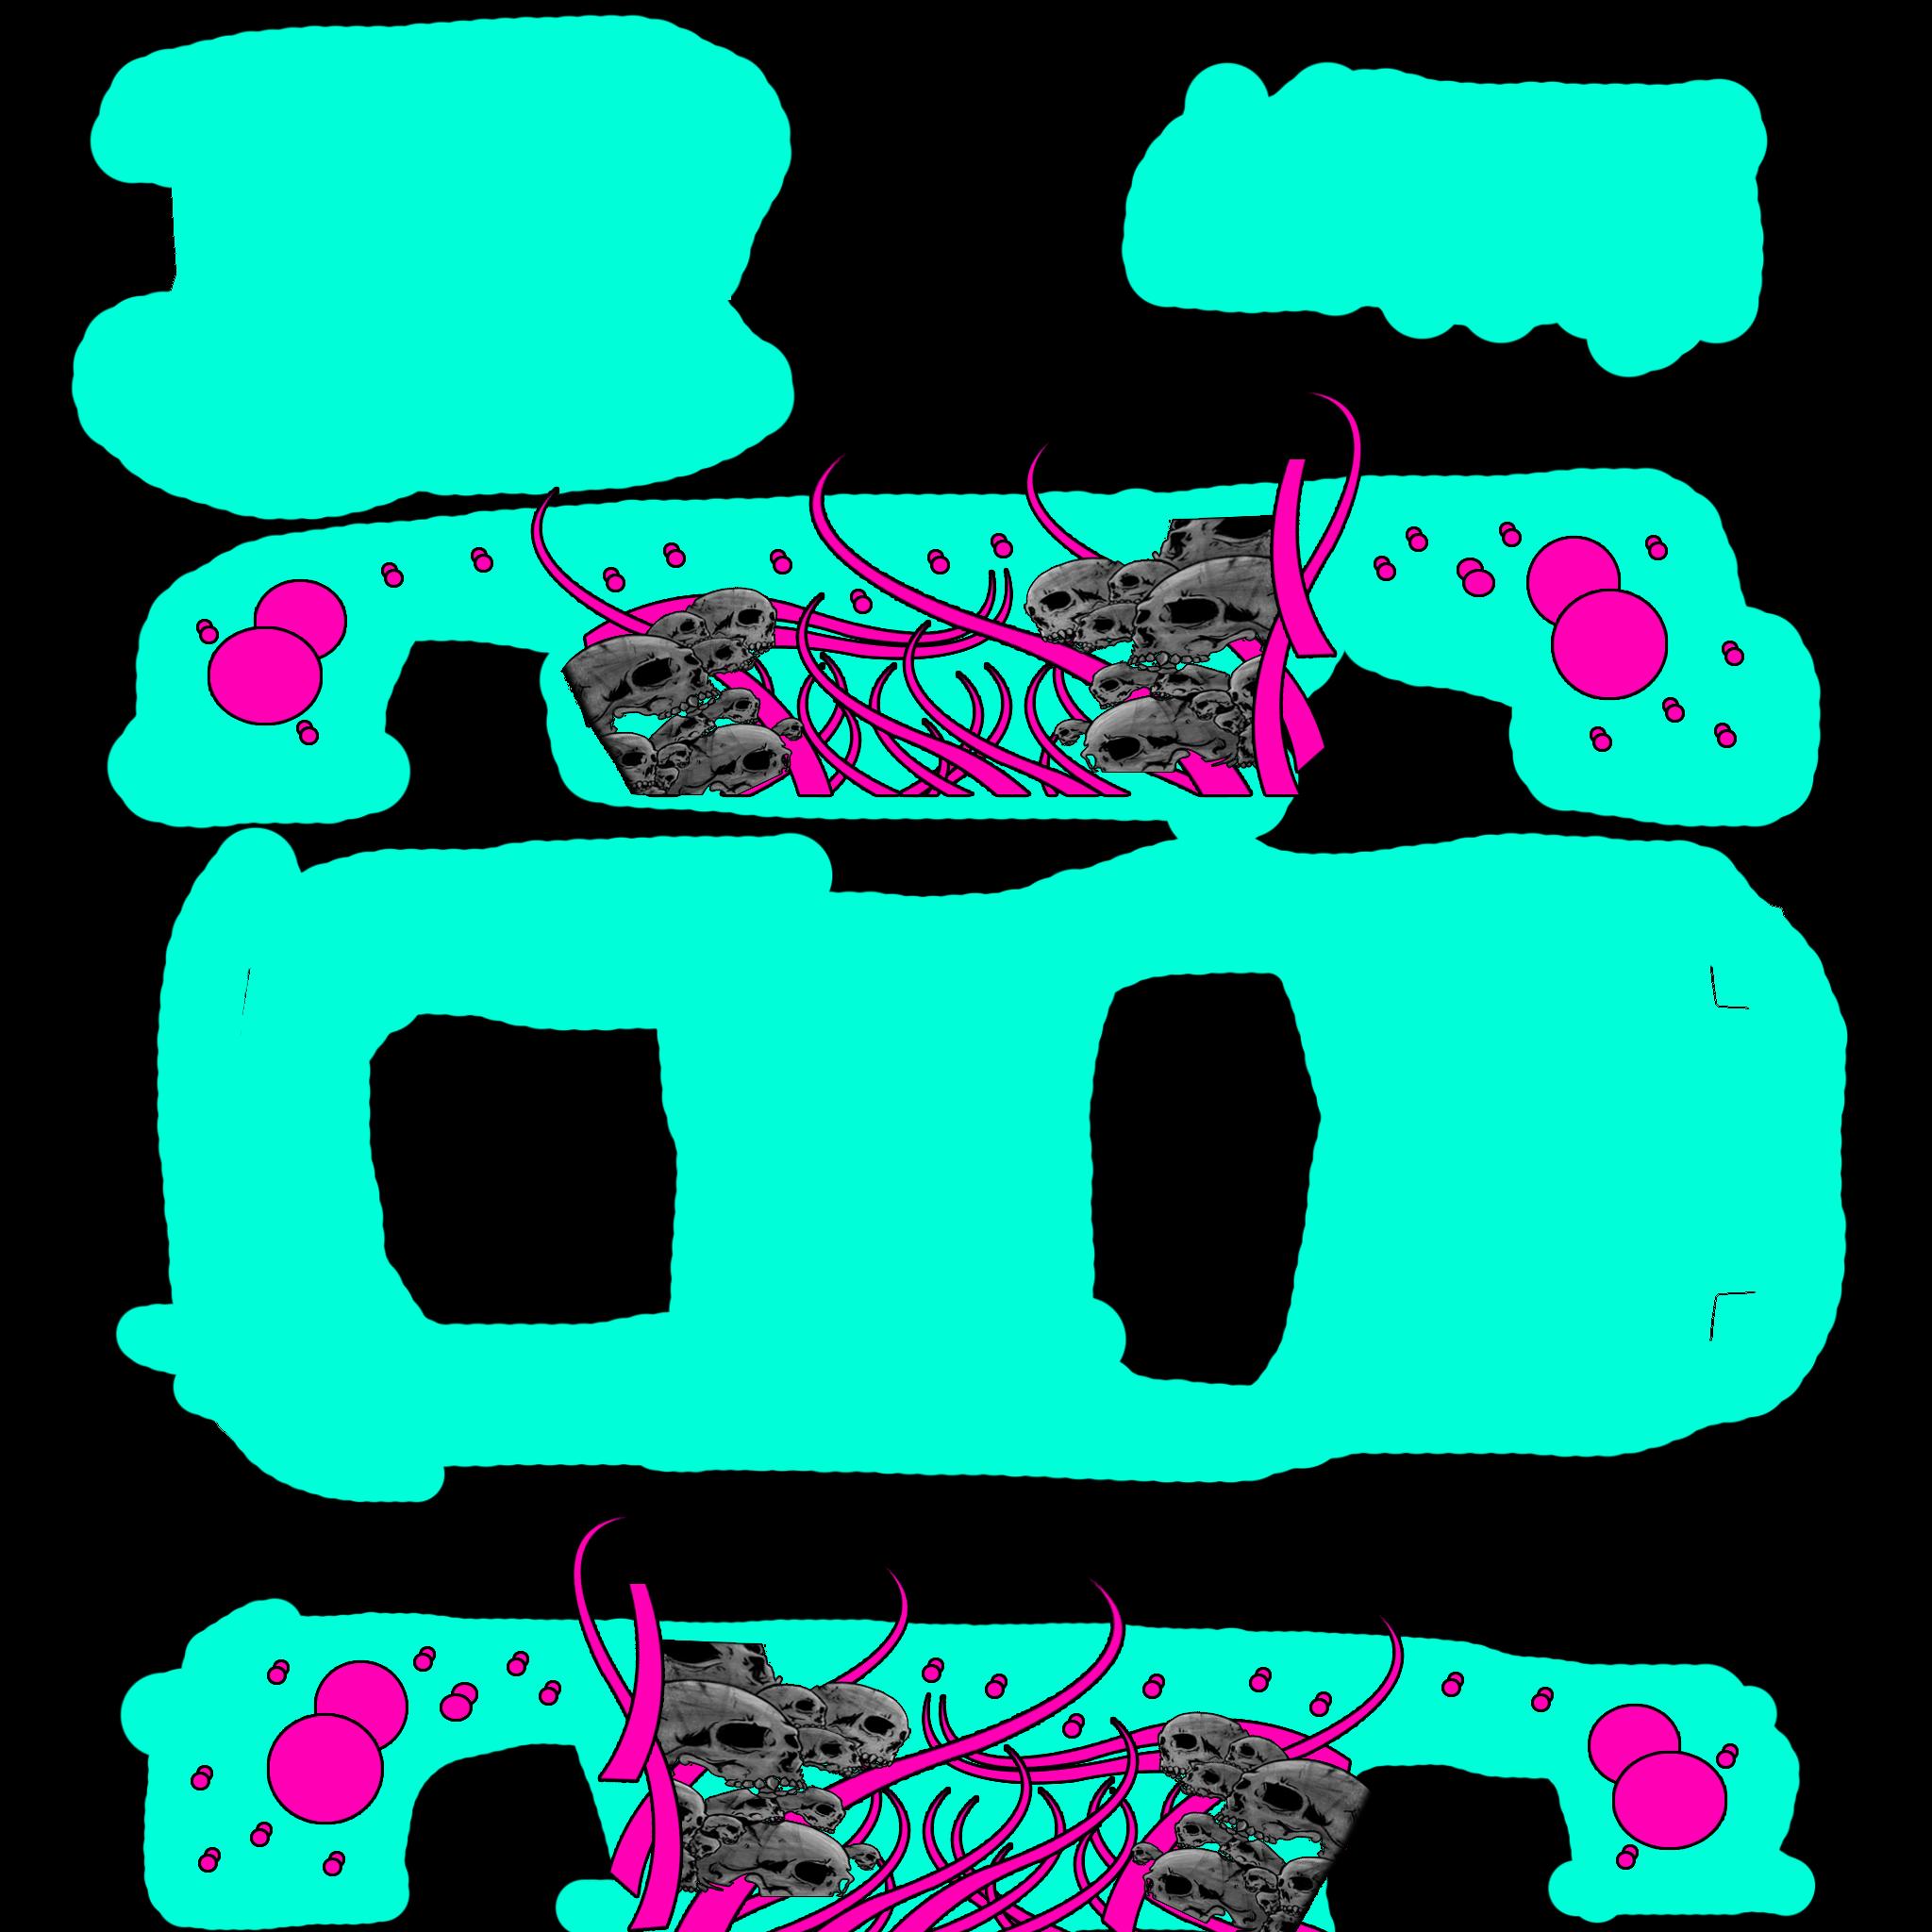 High Octane Drift Wrap Skulls Without Hood Graph By Cradedesigns